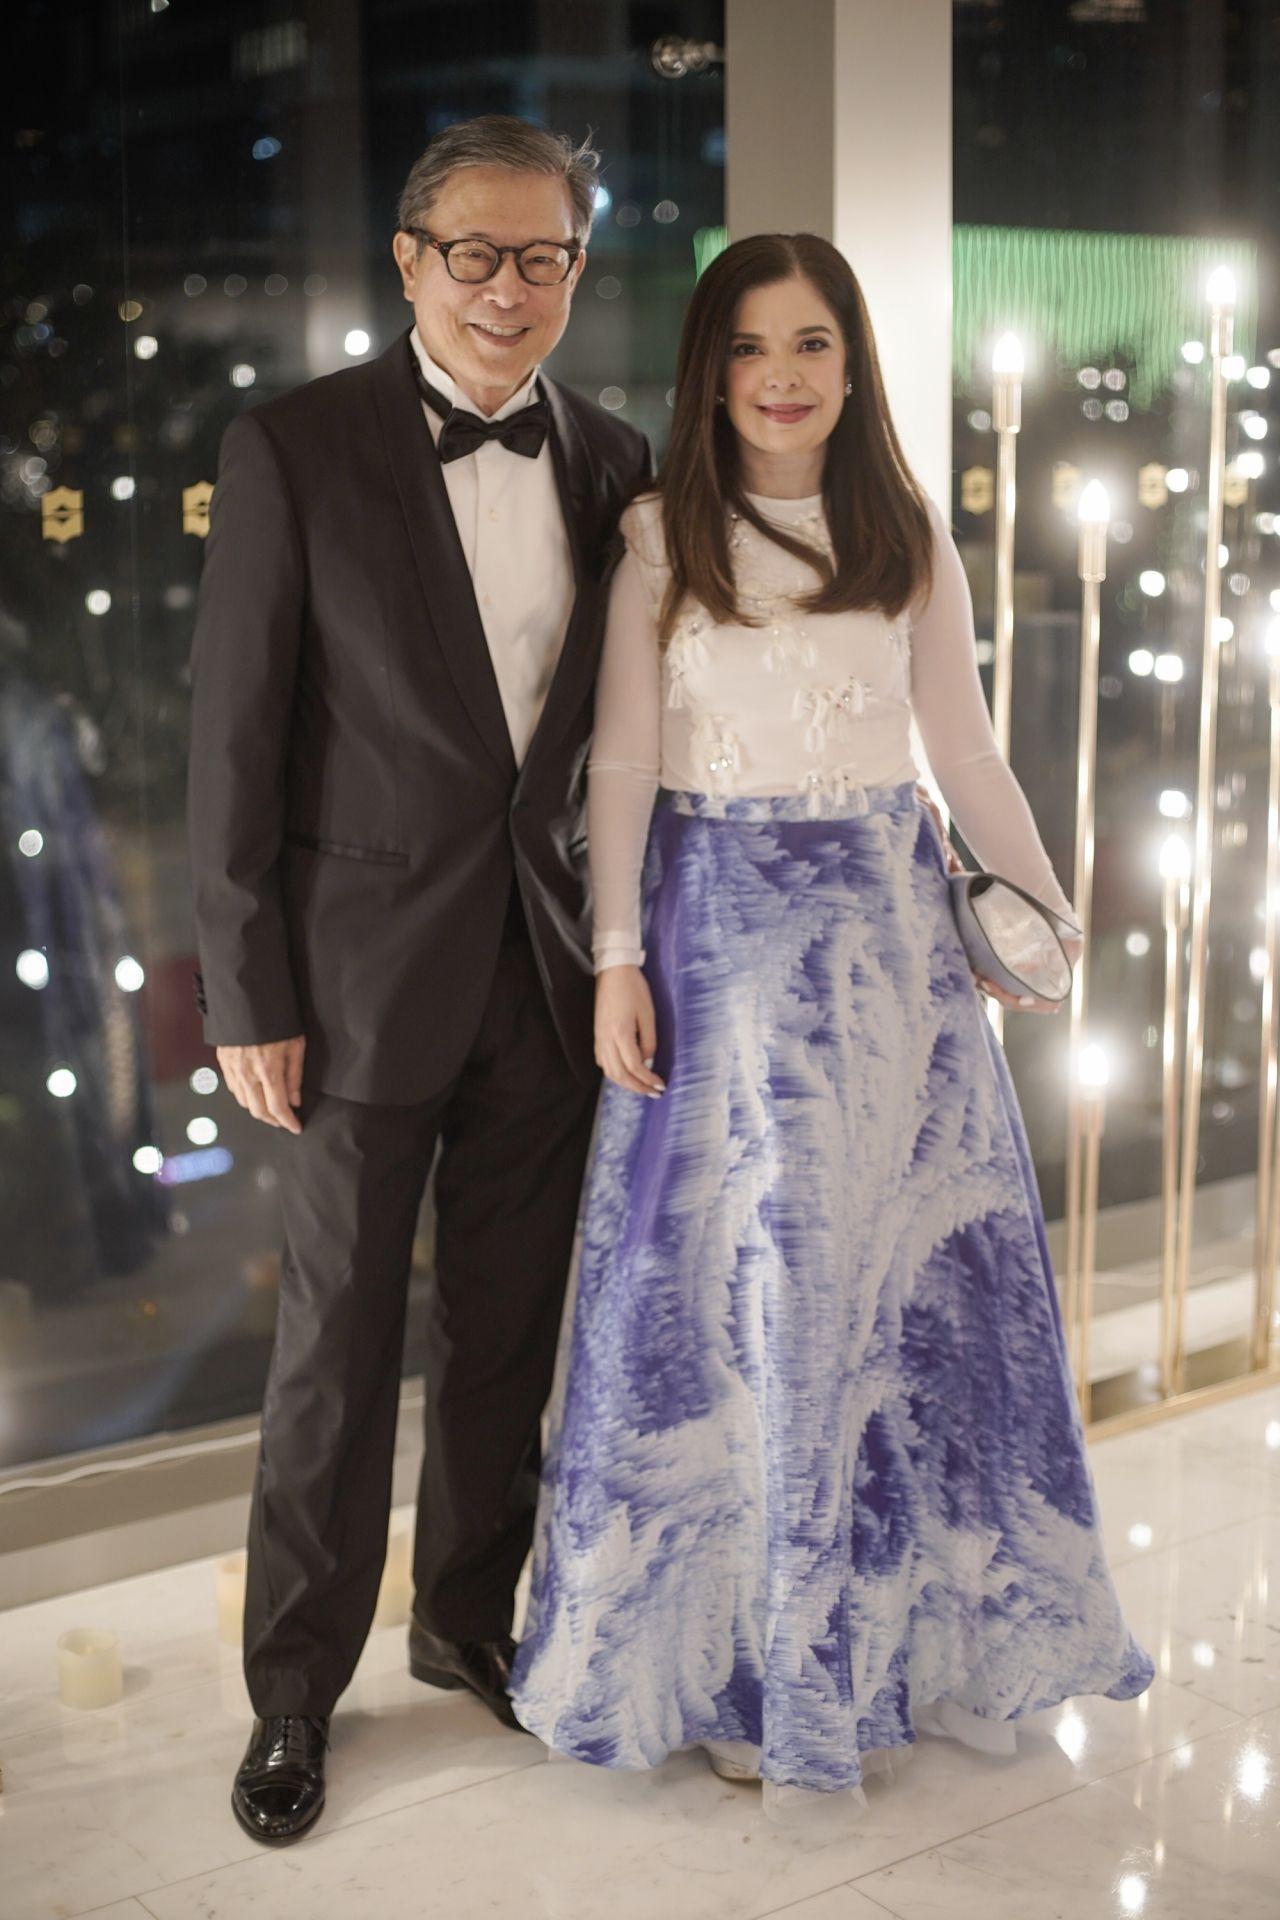 Johnny Velazquez and Nicole Ortega